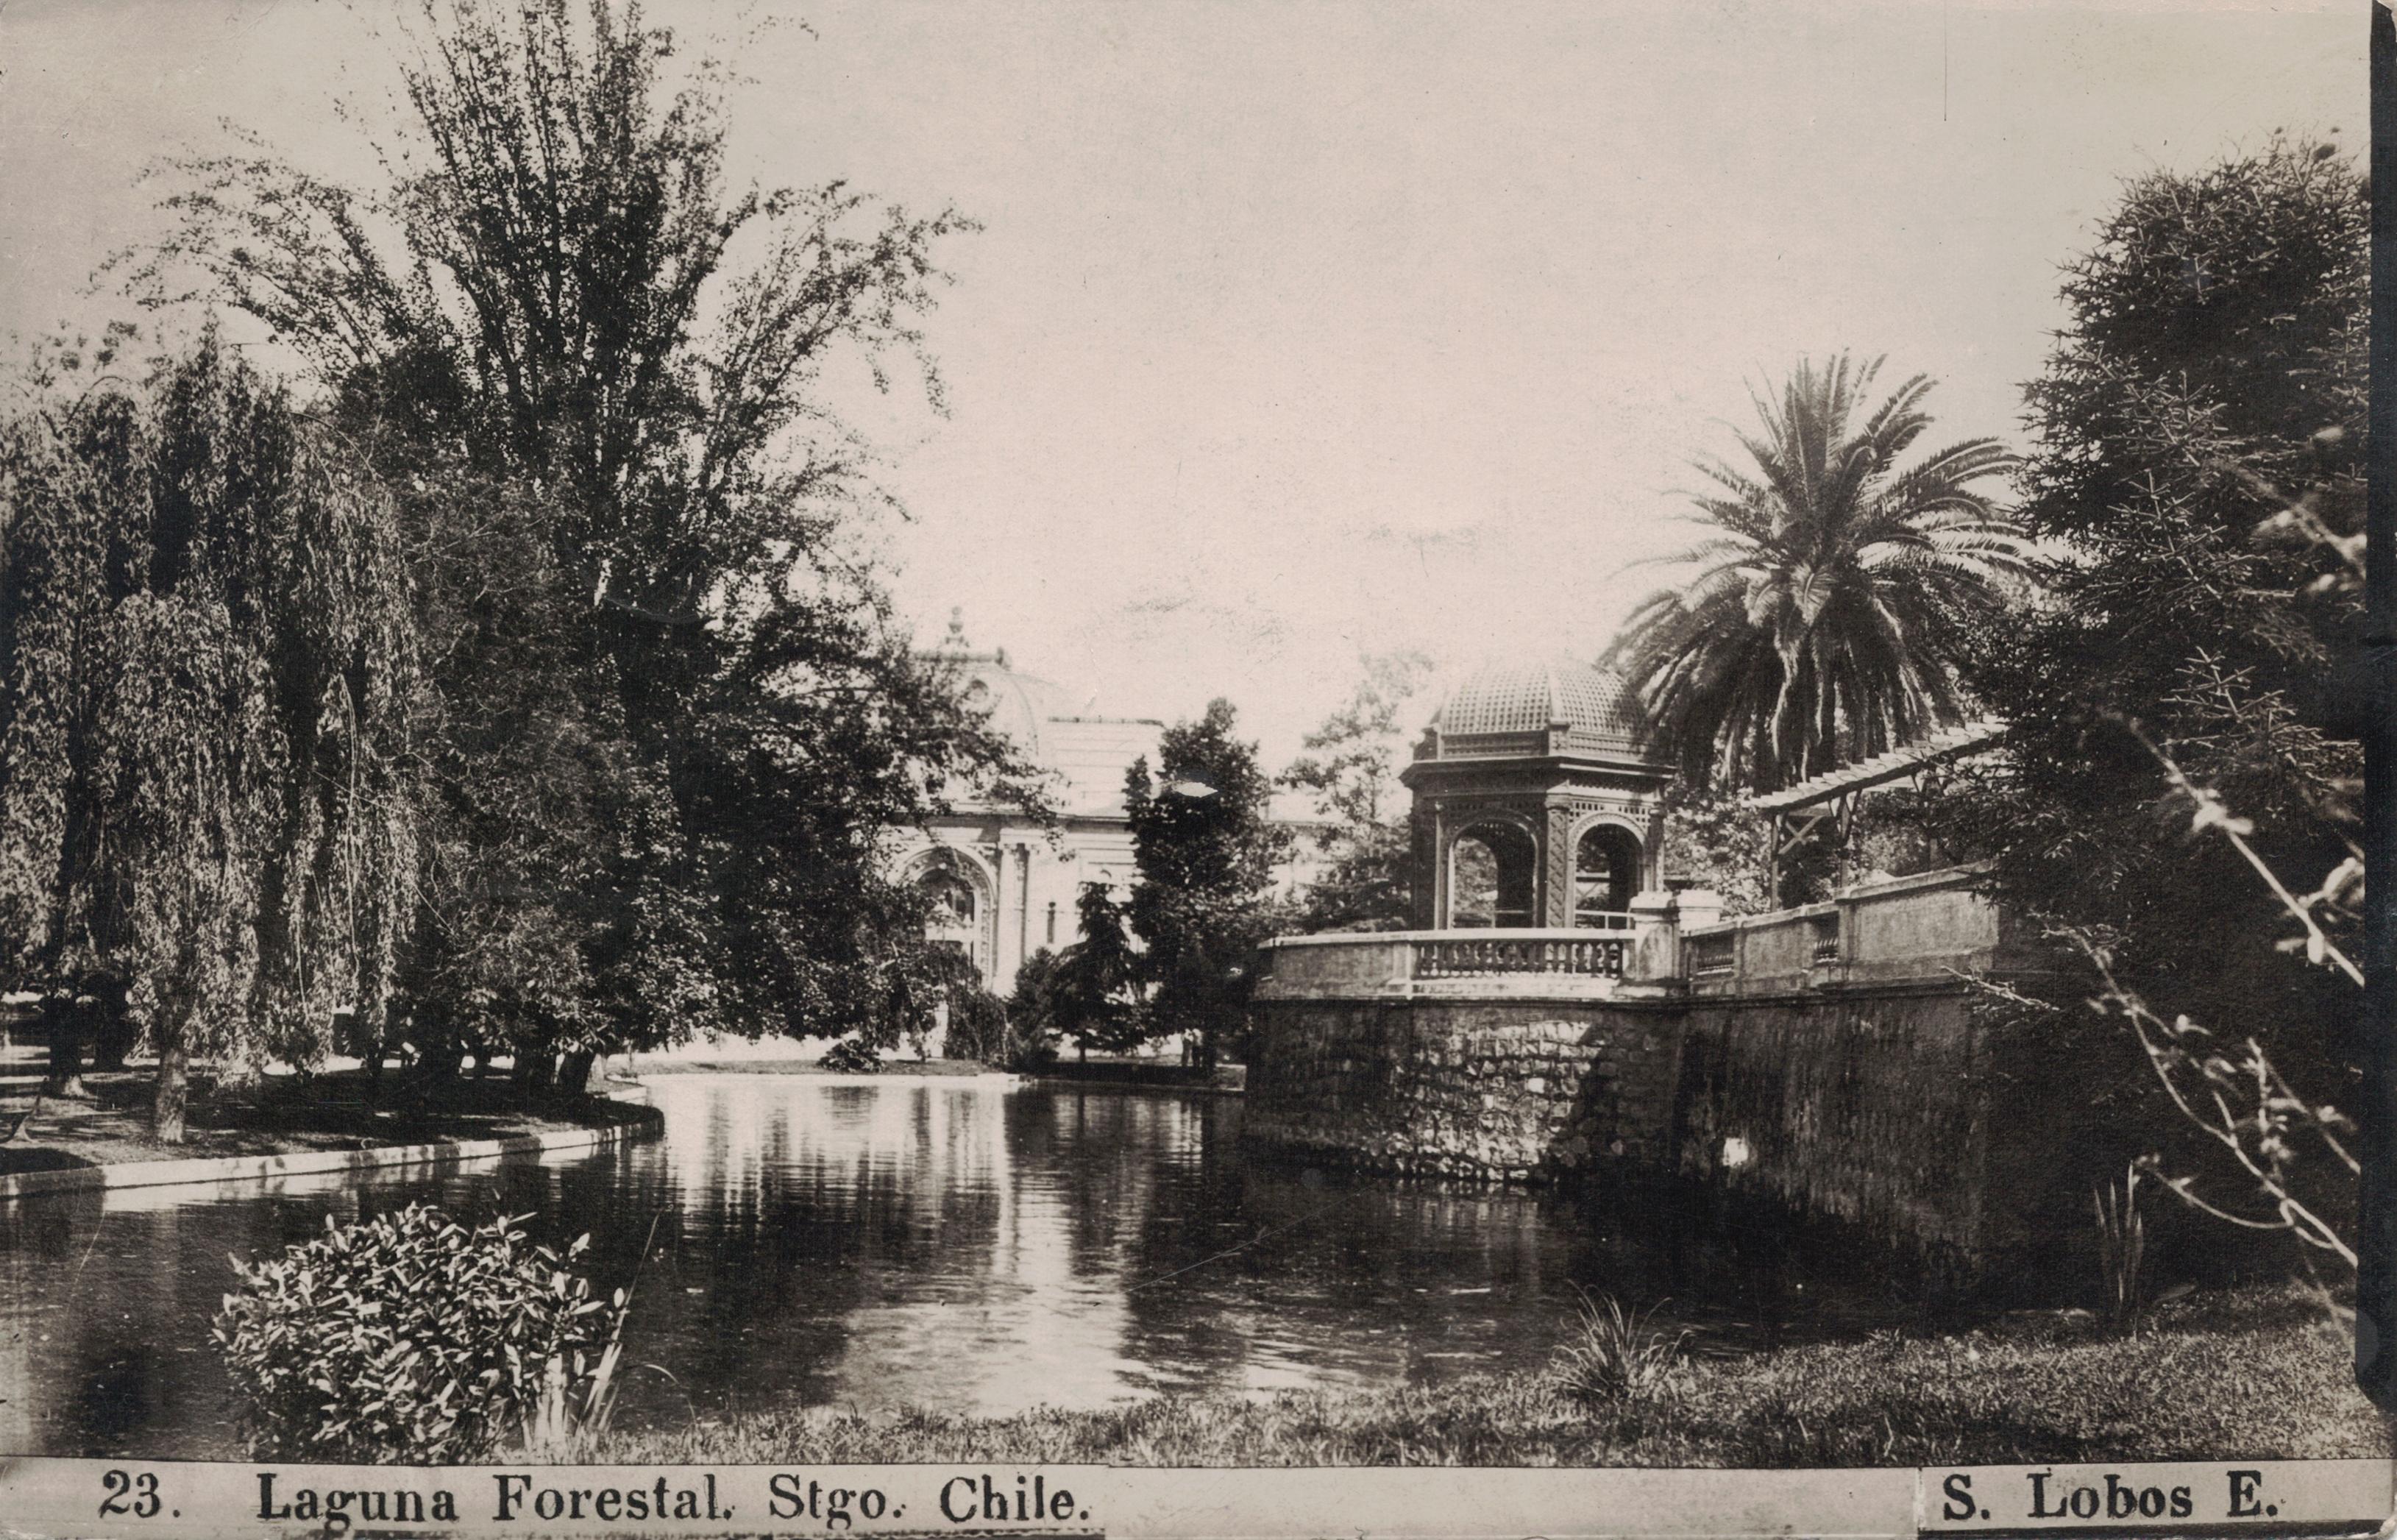 Enterreno - Fotos históricas de chile - fotos antiguas de Chile - Laguna Parque Forestal, 1918